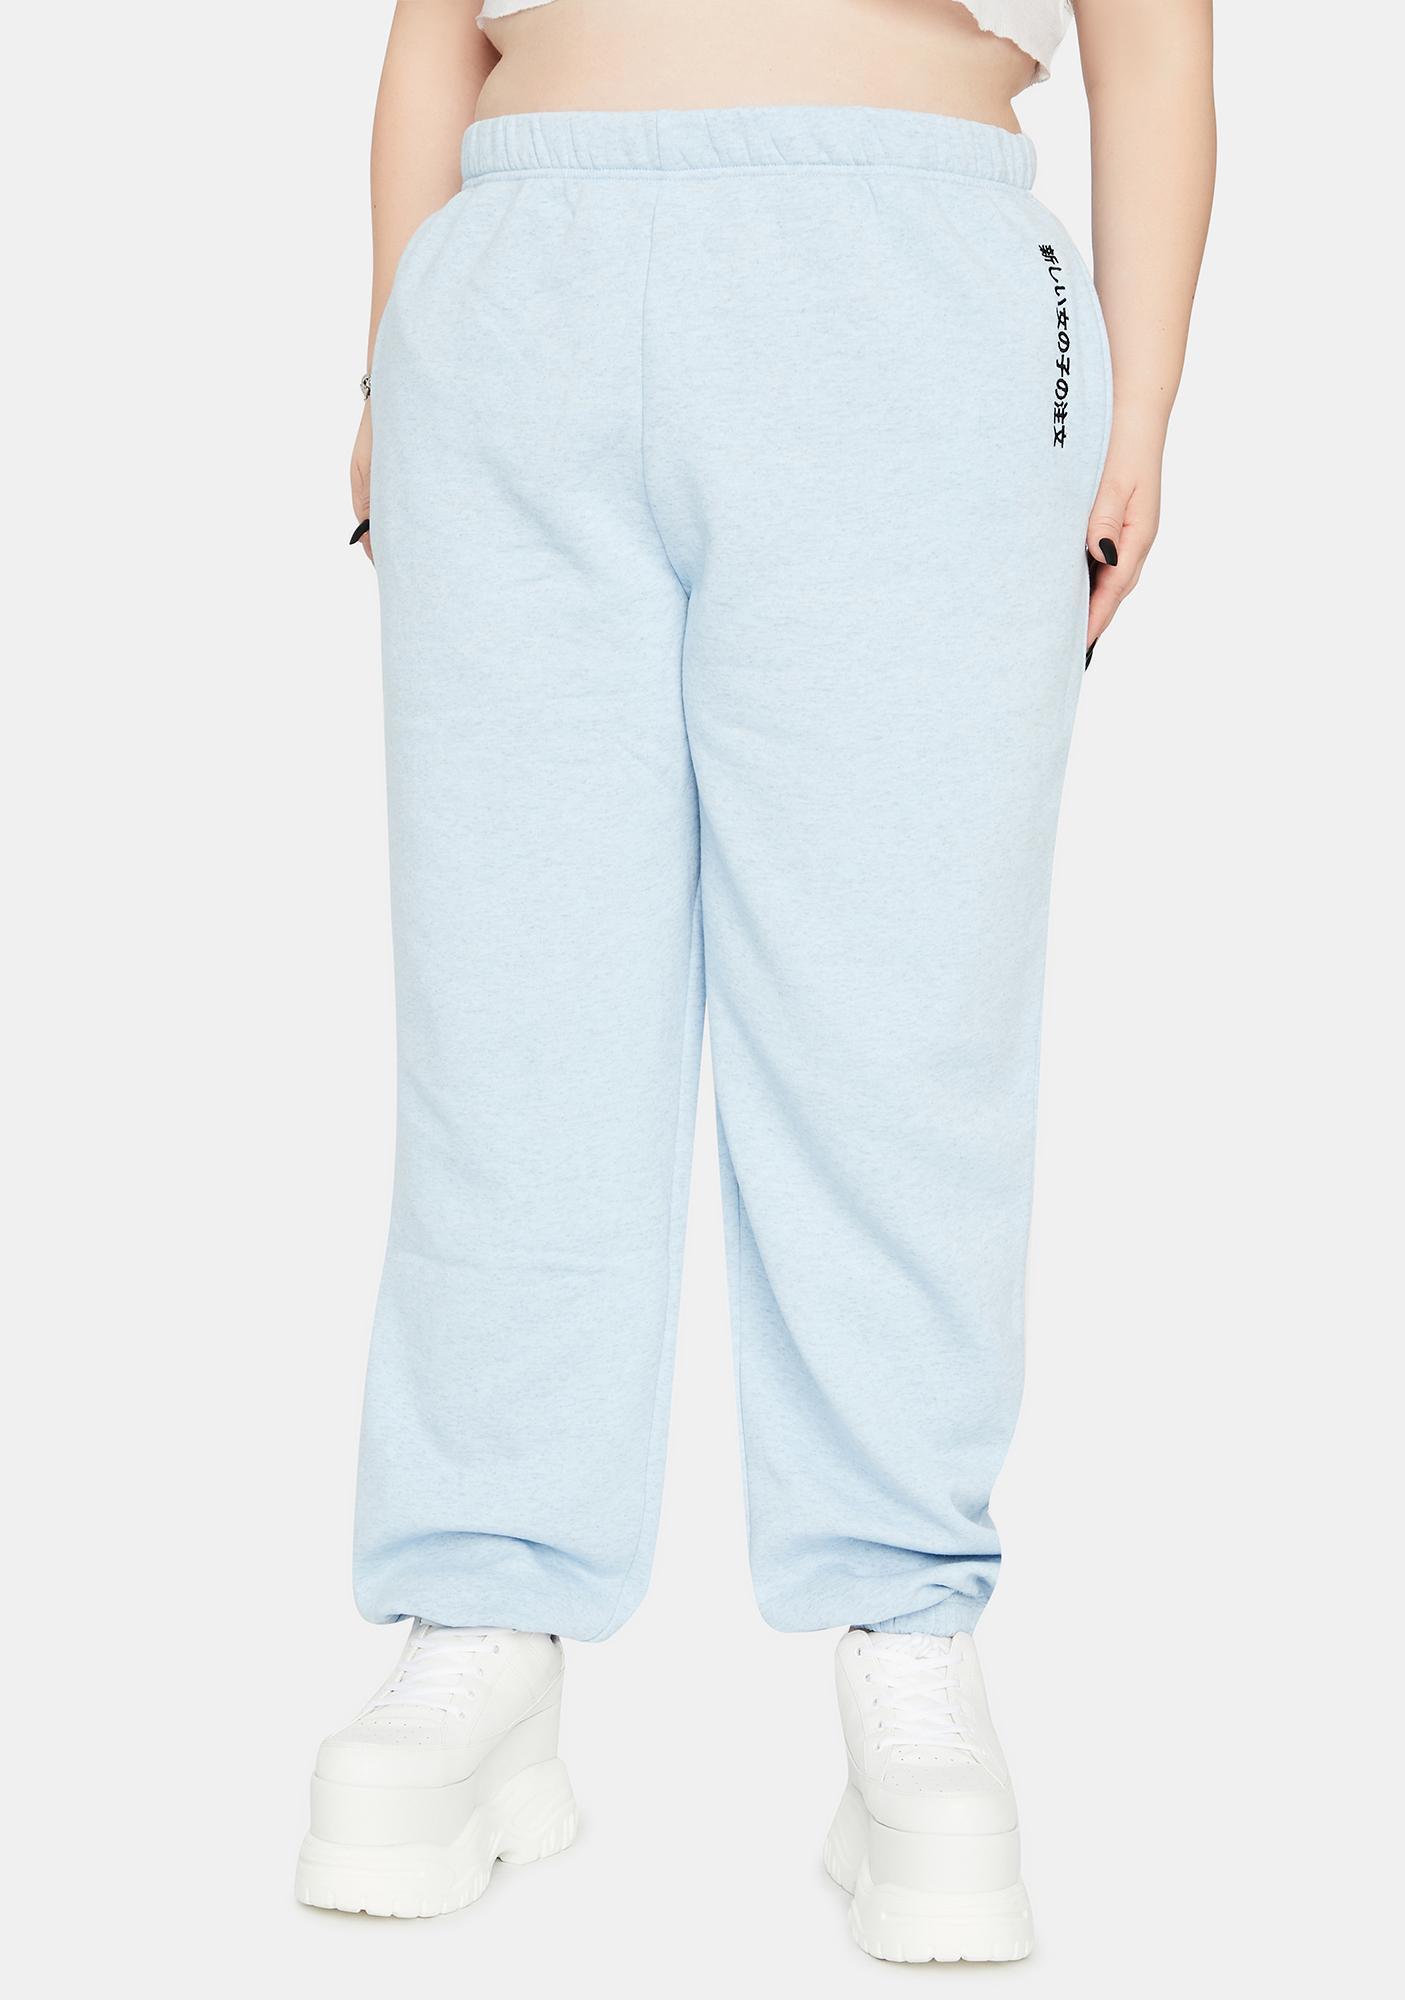 NEW GIRL ORDER Curve Blue Kanji Jogger Sweatpants